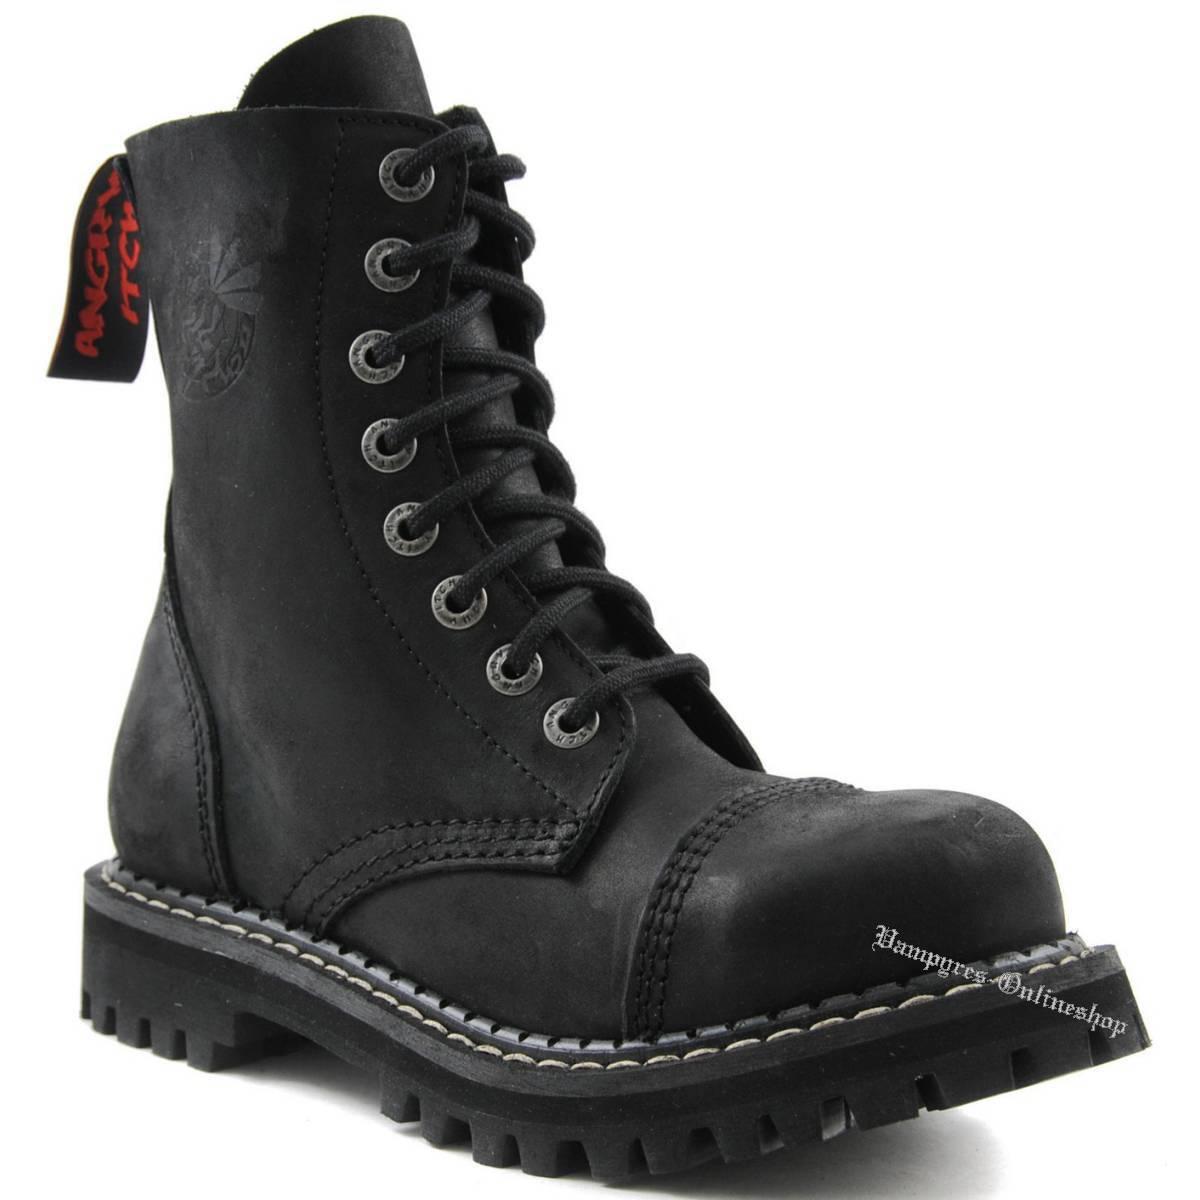 Angry Itch 8-Loch Vintage Schwarz Rangers Leder Stiefel Schuhe Stiefel Stahlkappen